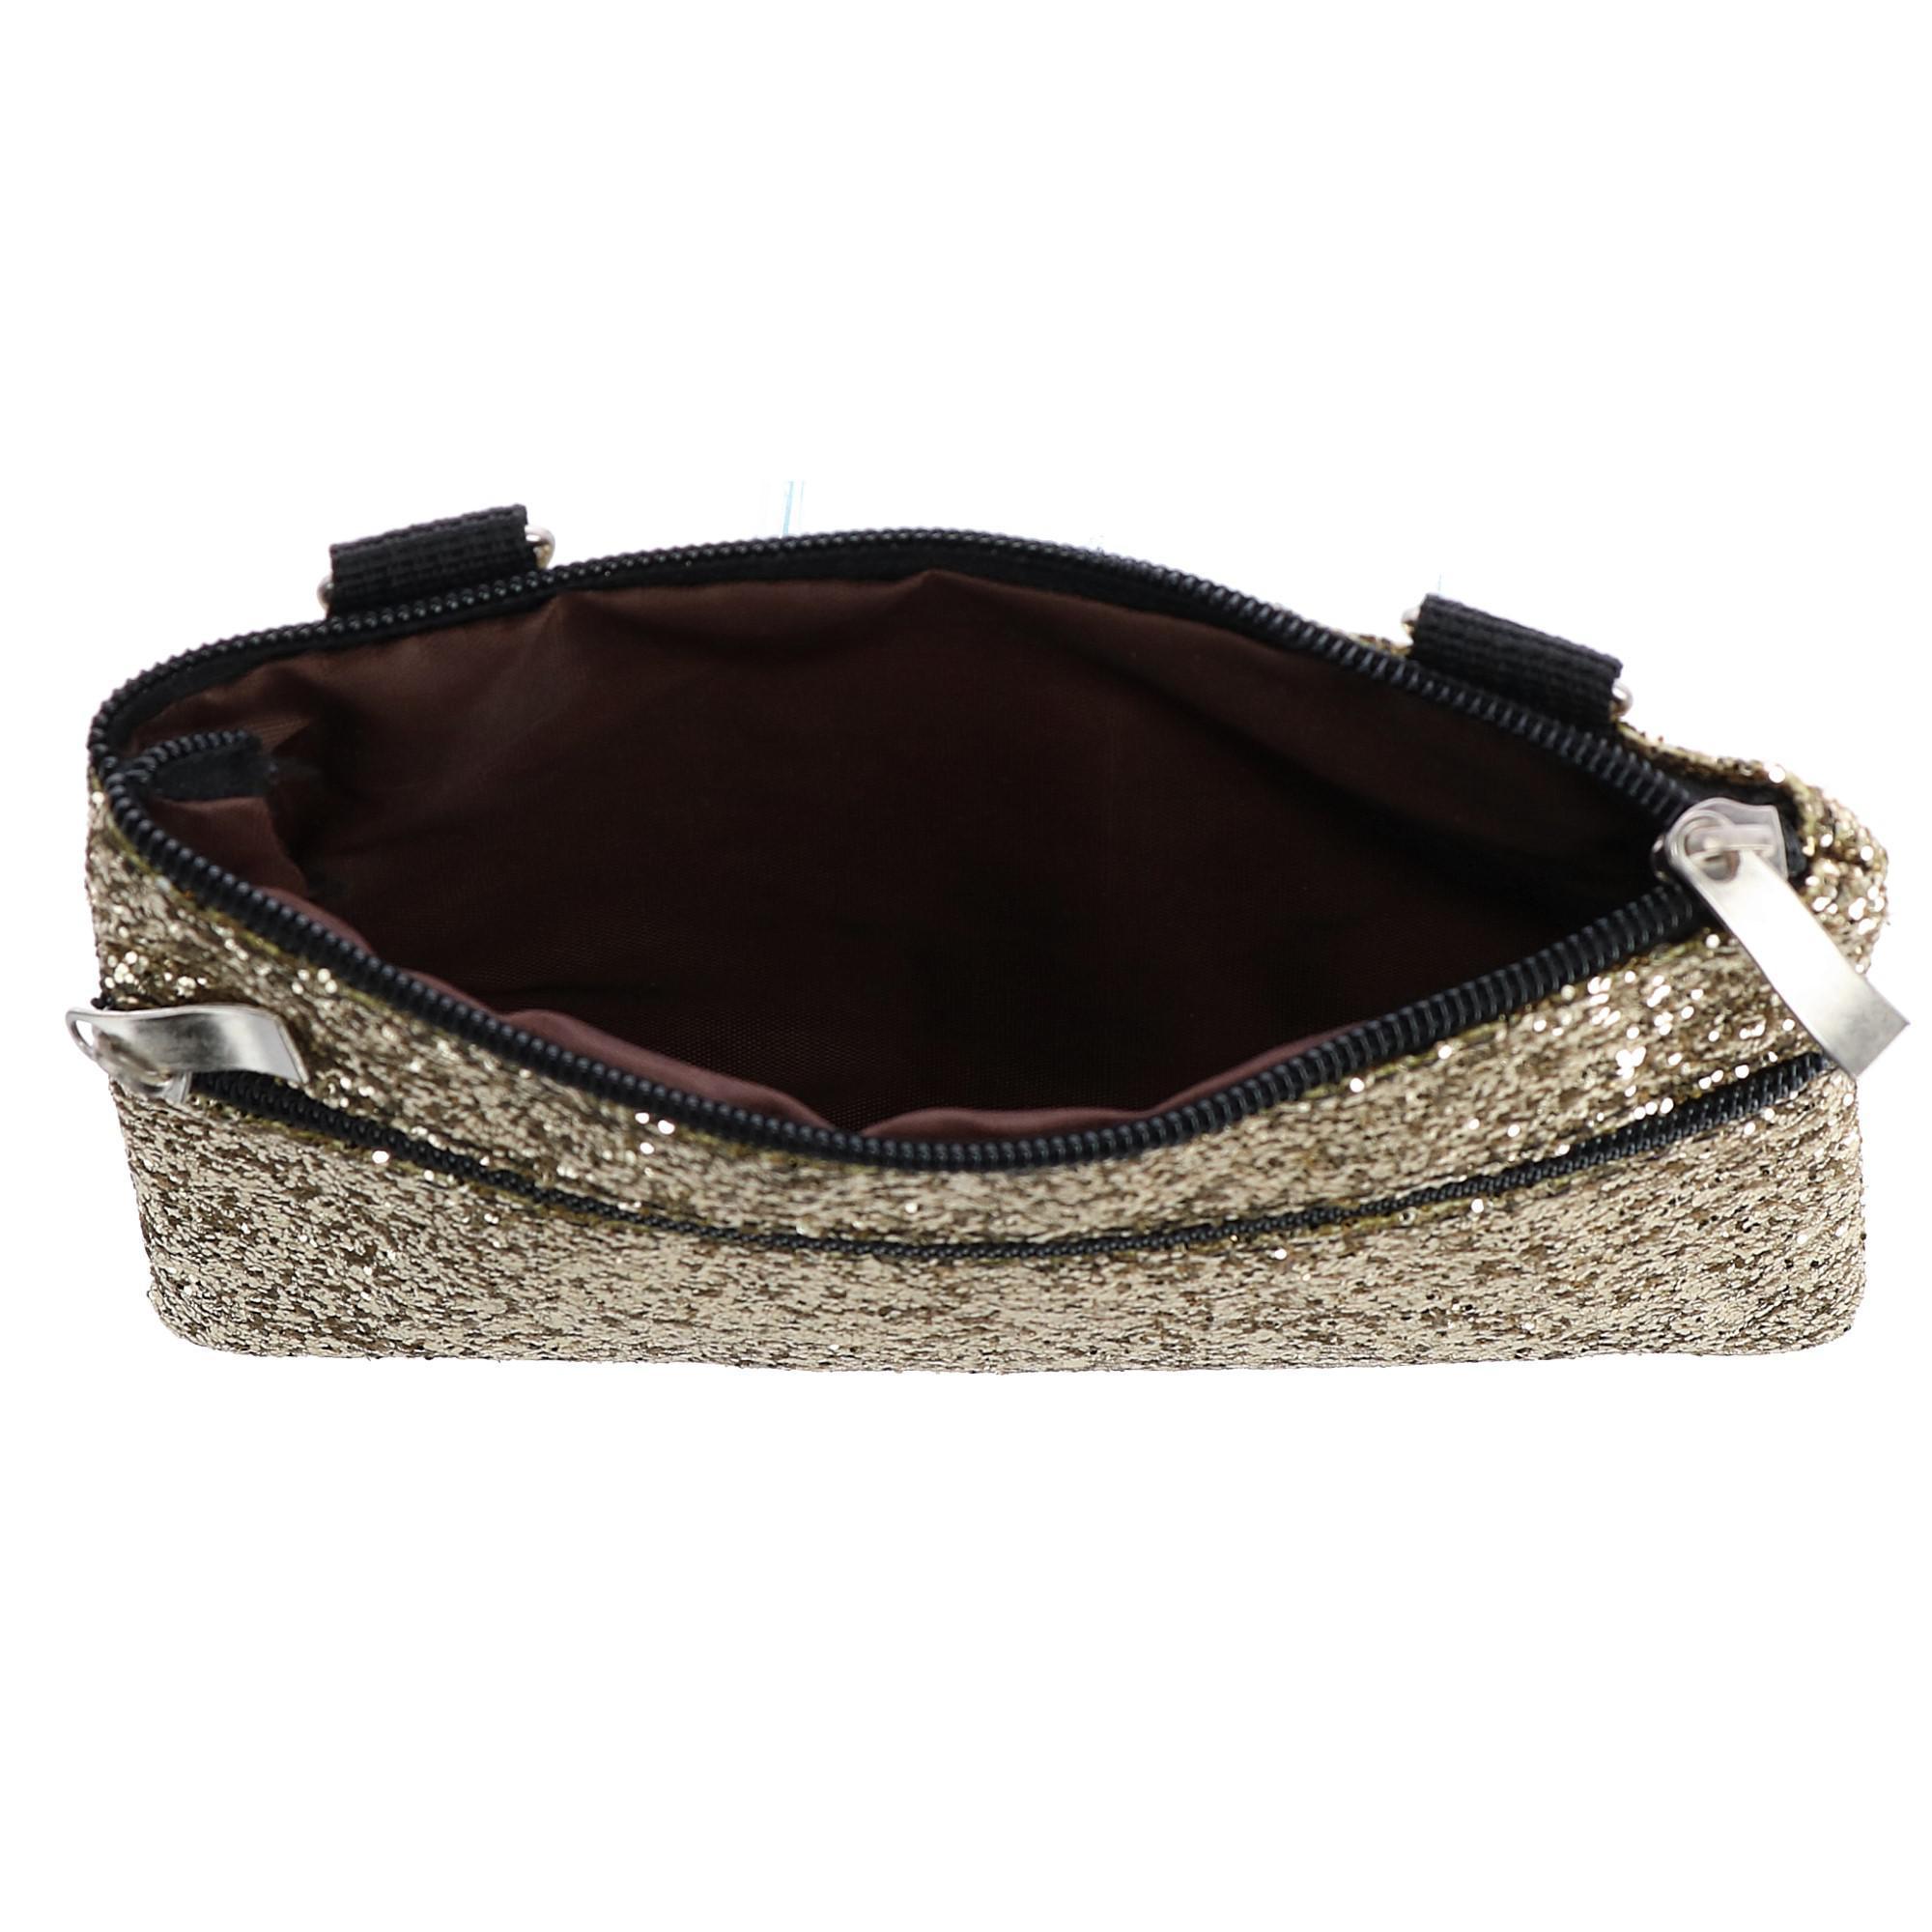 New-2-Moda-Fashion-Glitter-Waist-Pack-Convertible-Cross-Body-Bag thumbnail 3